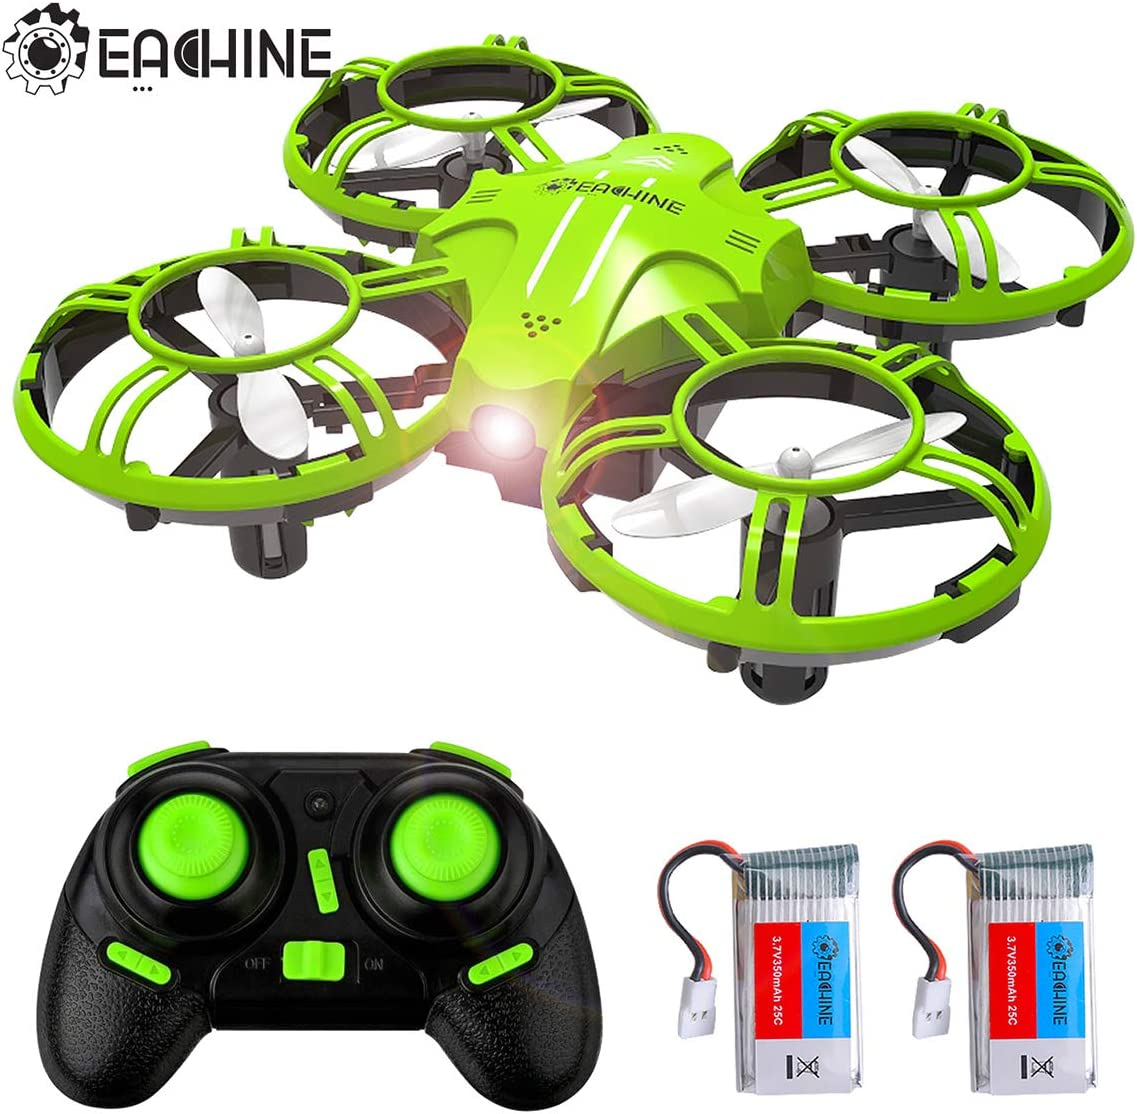 EACHINE E016H Mini Drone para Niños con Control de Altura, 16 Minutos Vuelo de Tiempo Largo Hélice Protección Mini Quadcopter con Modo sin Cabeza Alarma de Batería Baja 3D Flips LED Luz (2Xbatería)